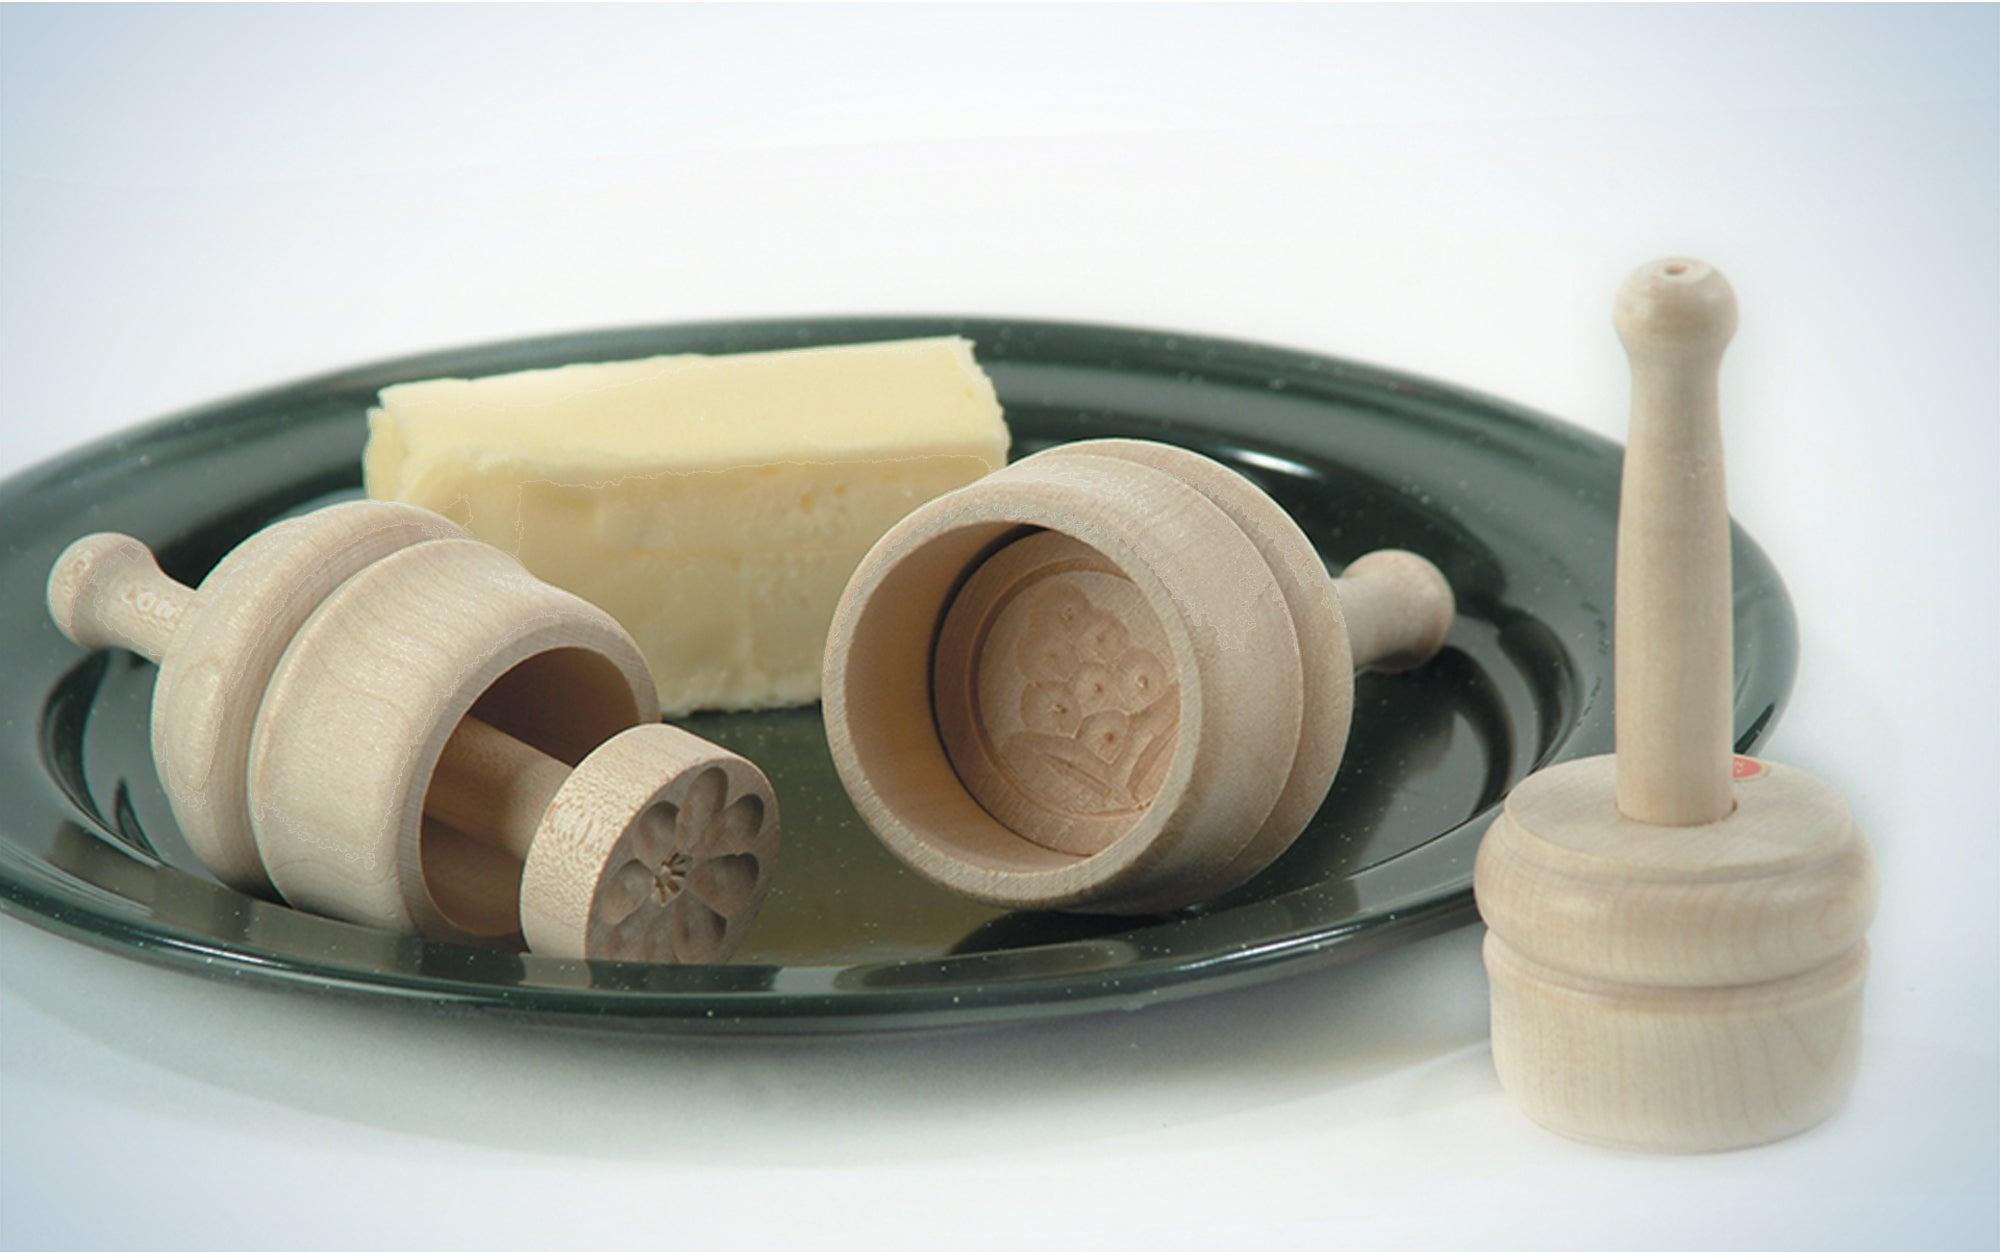 German Carved Butter Molds